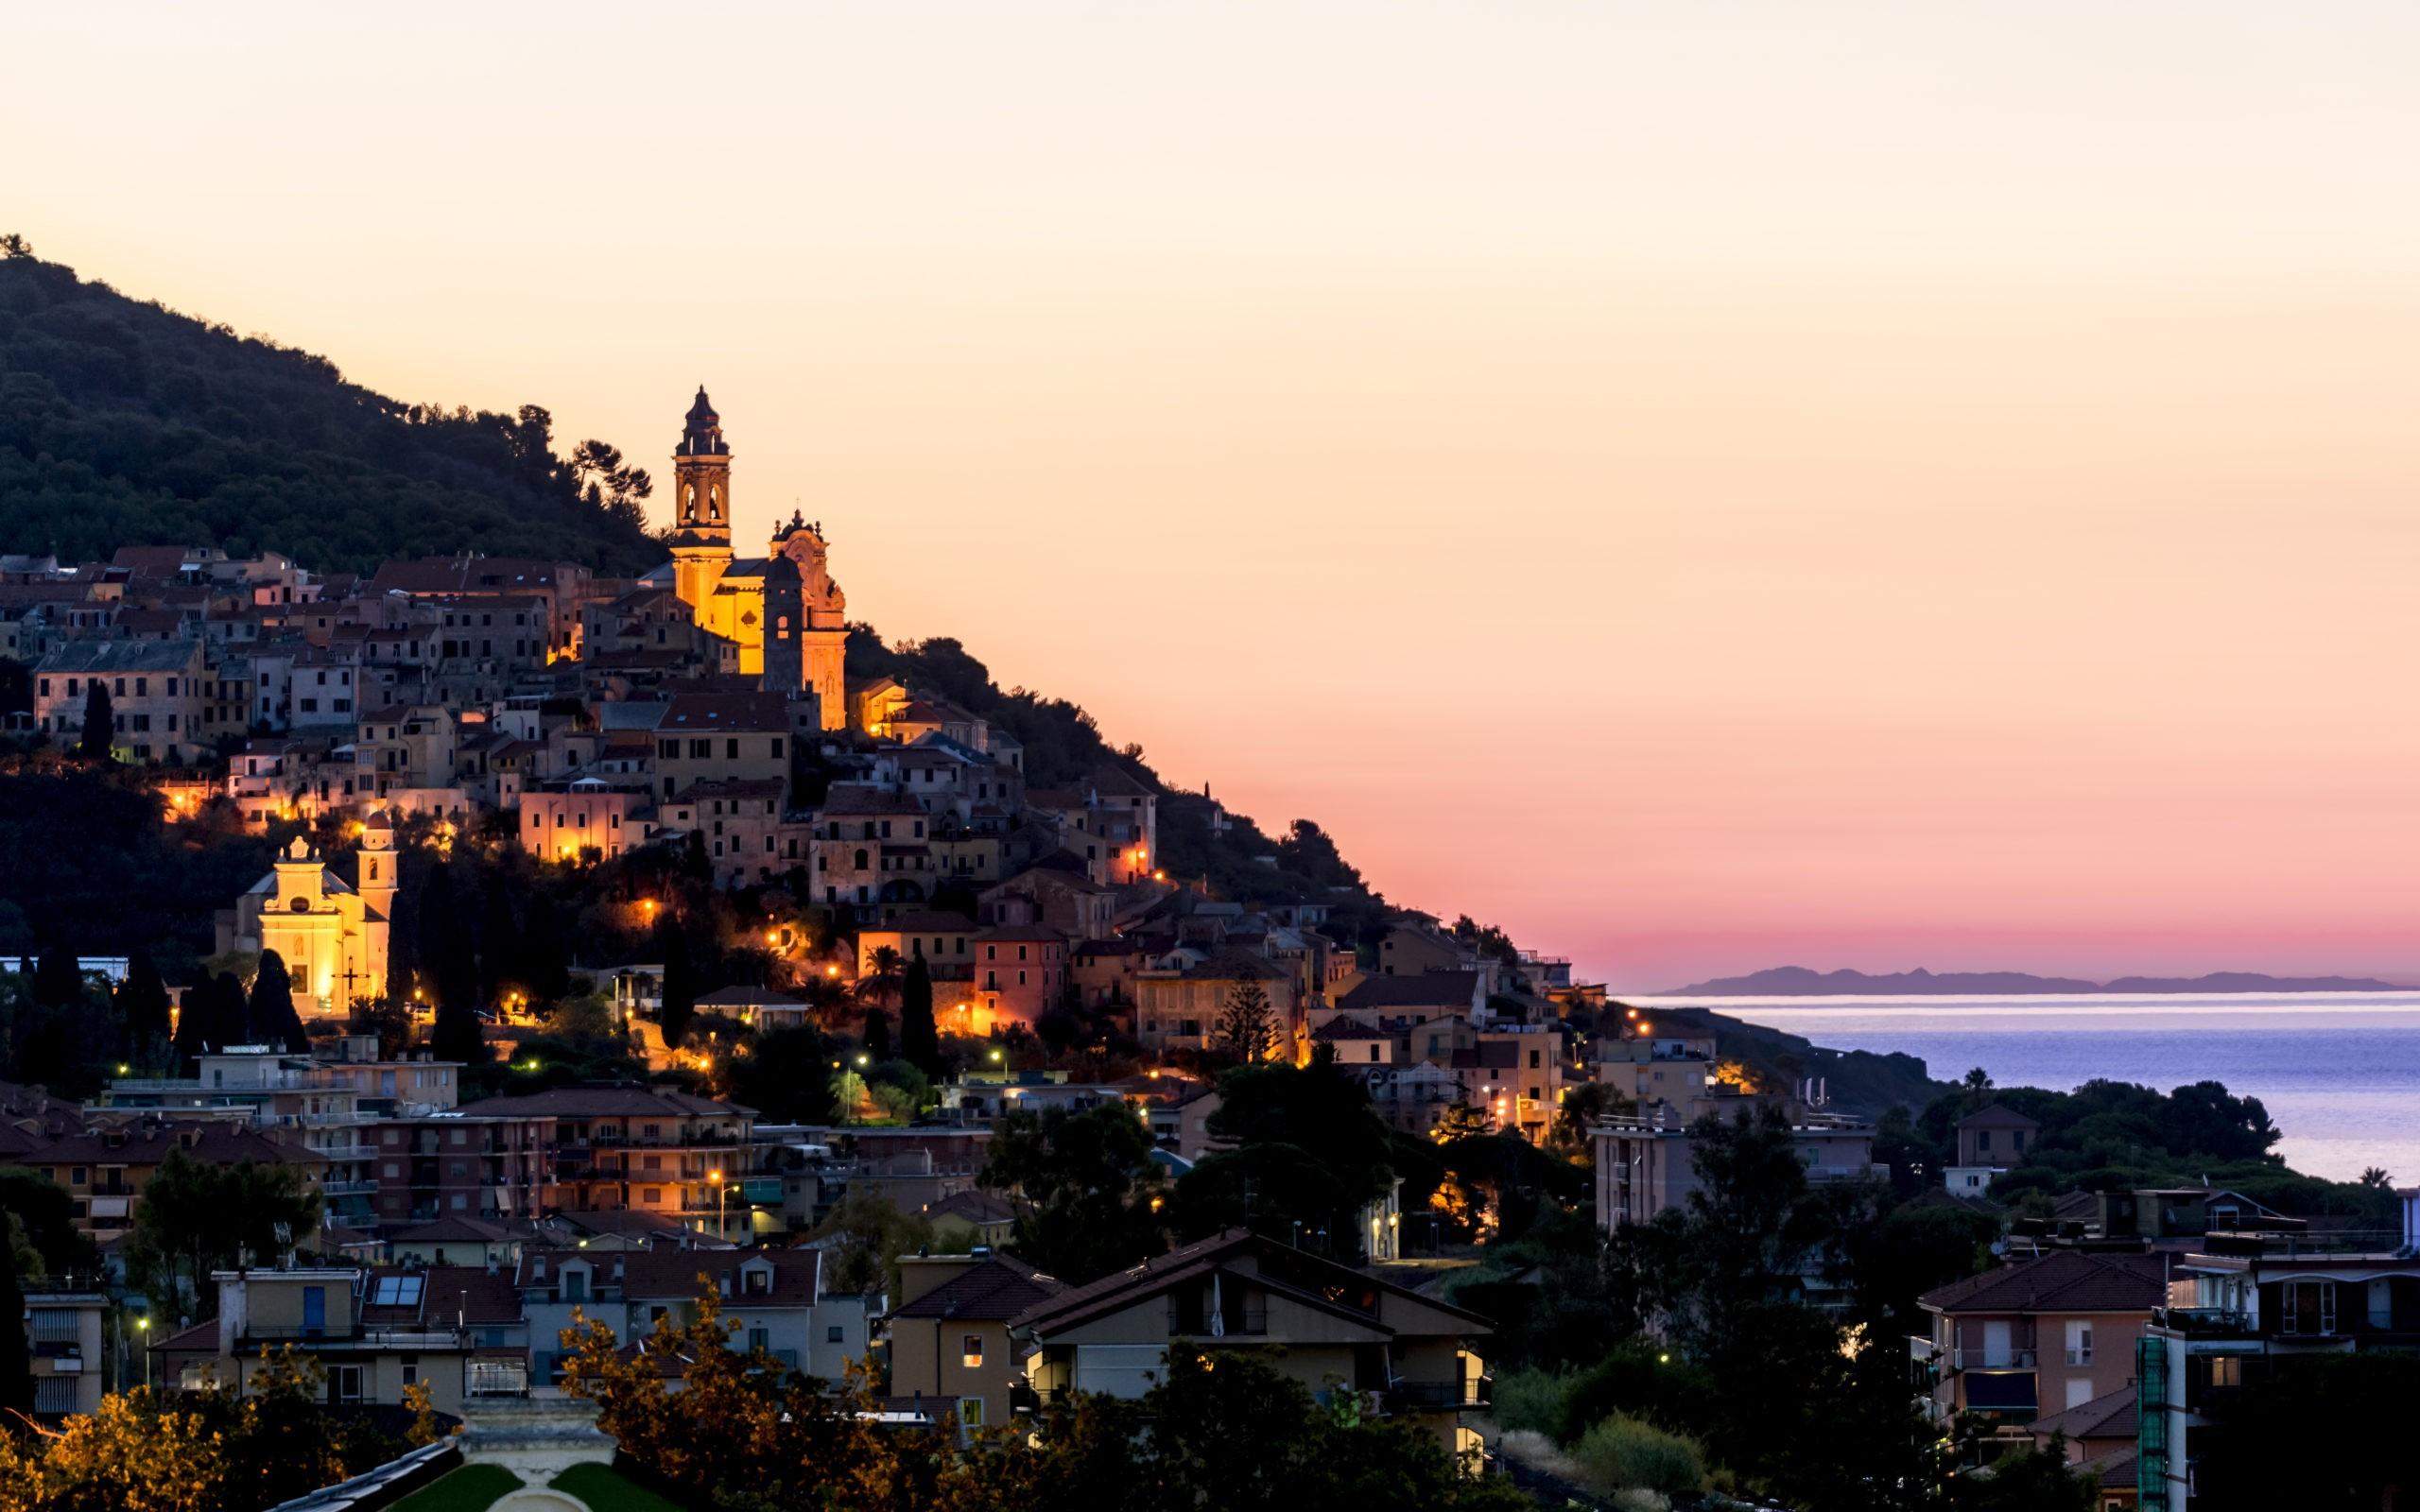 Zachód słońca w San Bartolomeo al Mare, fot. shutterstock.com